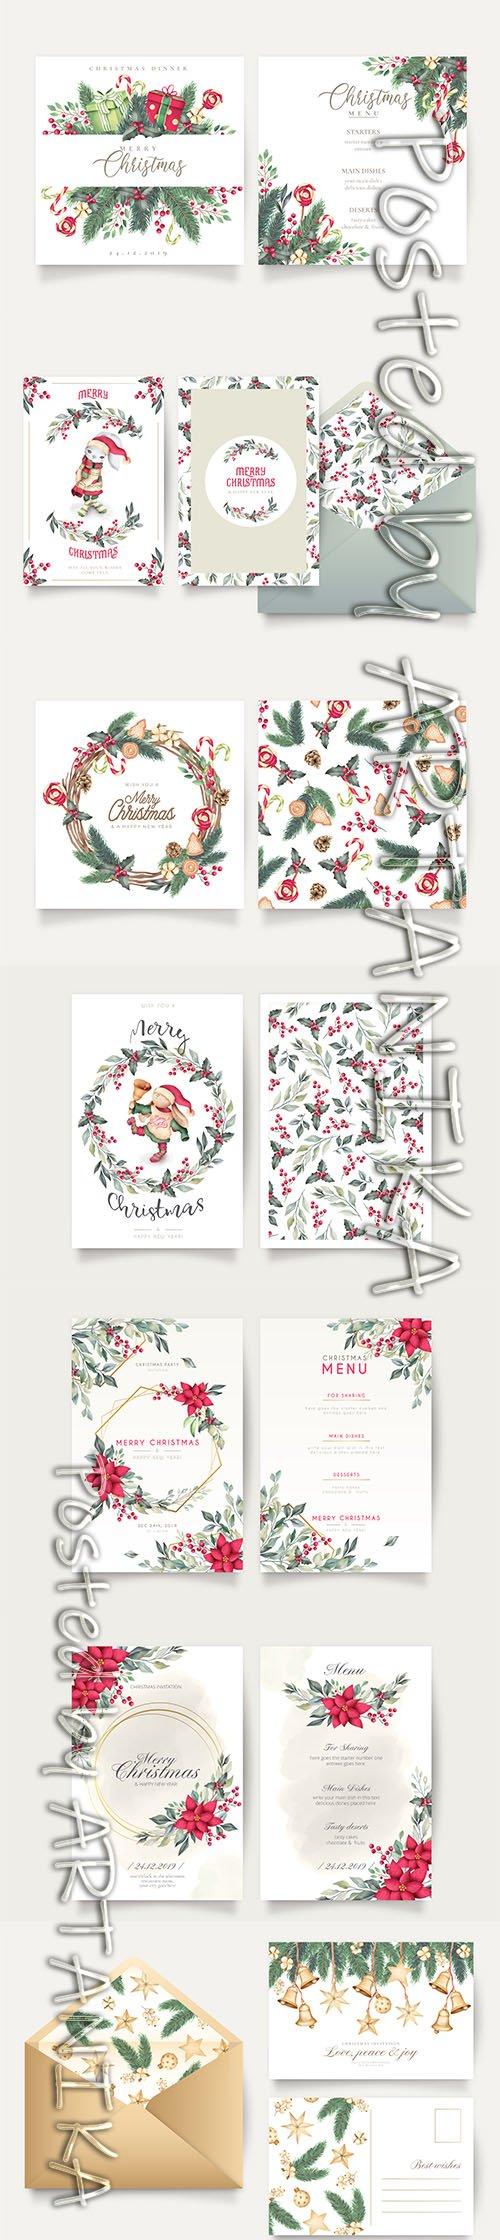 Set of Elegant Christmas Postcard, Menu and Greeting Cards Templates